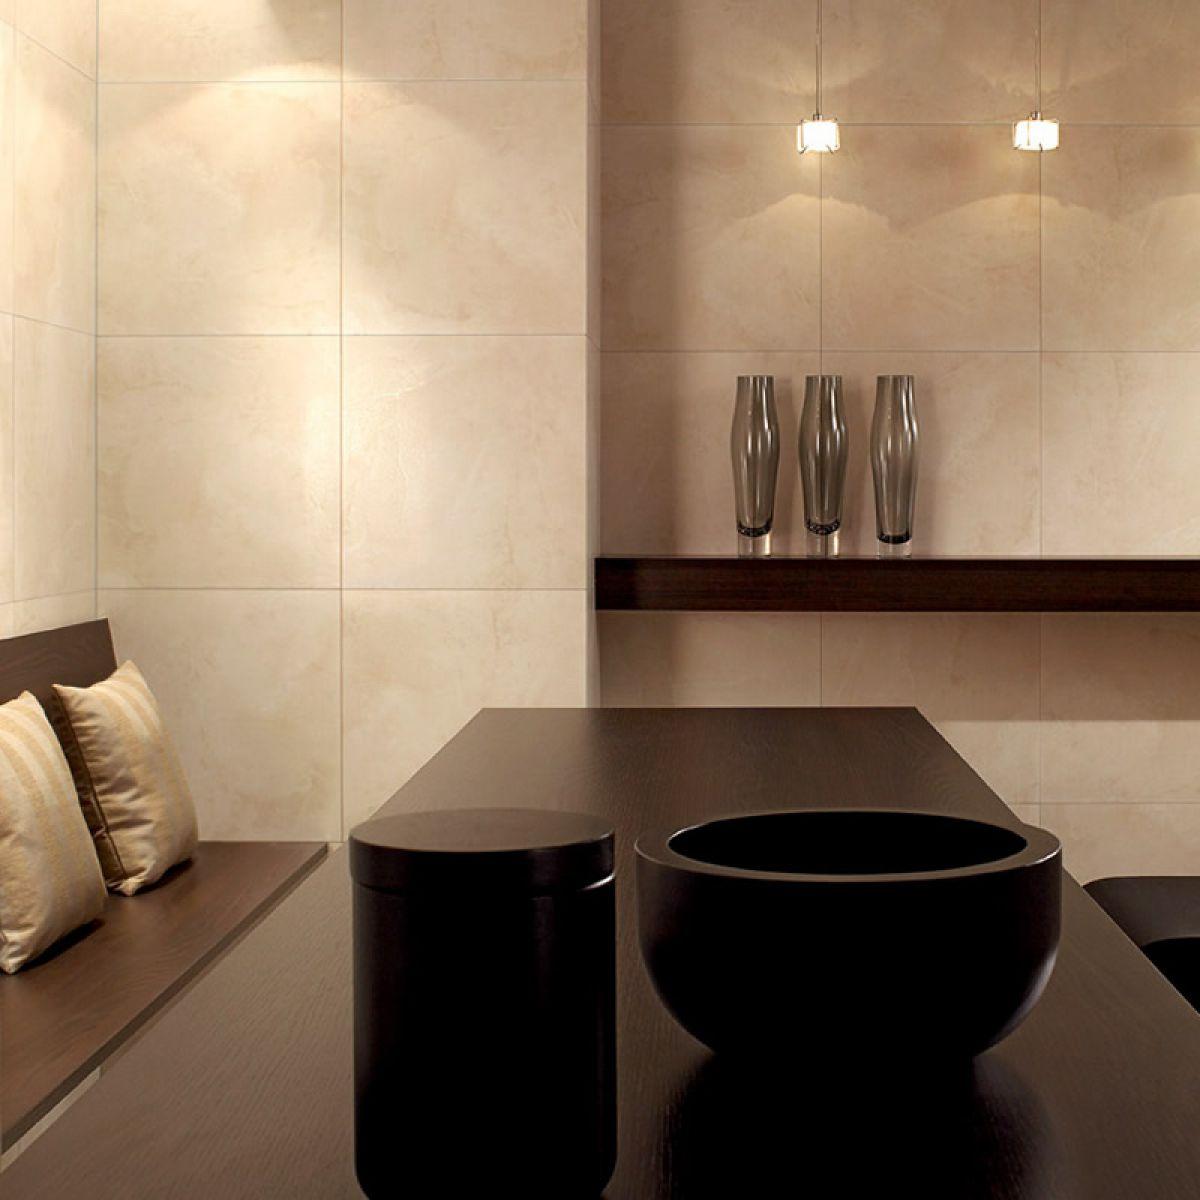 Bathroom Tiles Villeroy Boch villeroy & boch ivoire tile 2394 (30 x 60cm) : uk bathrooms